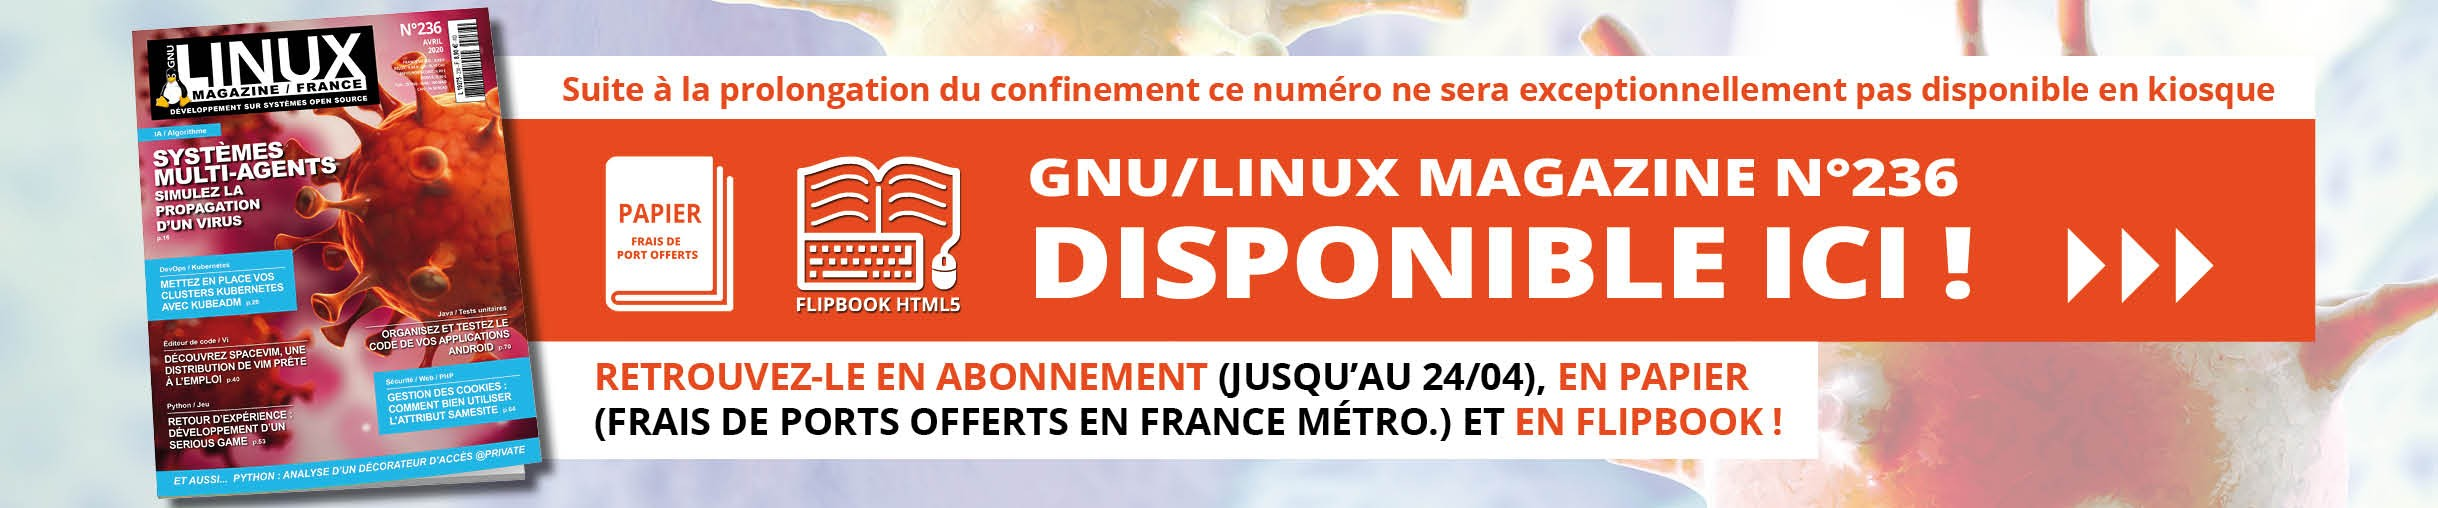 GNU/Linux Magazine n°236